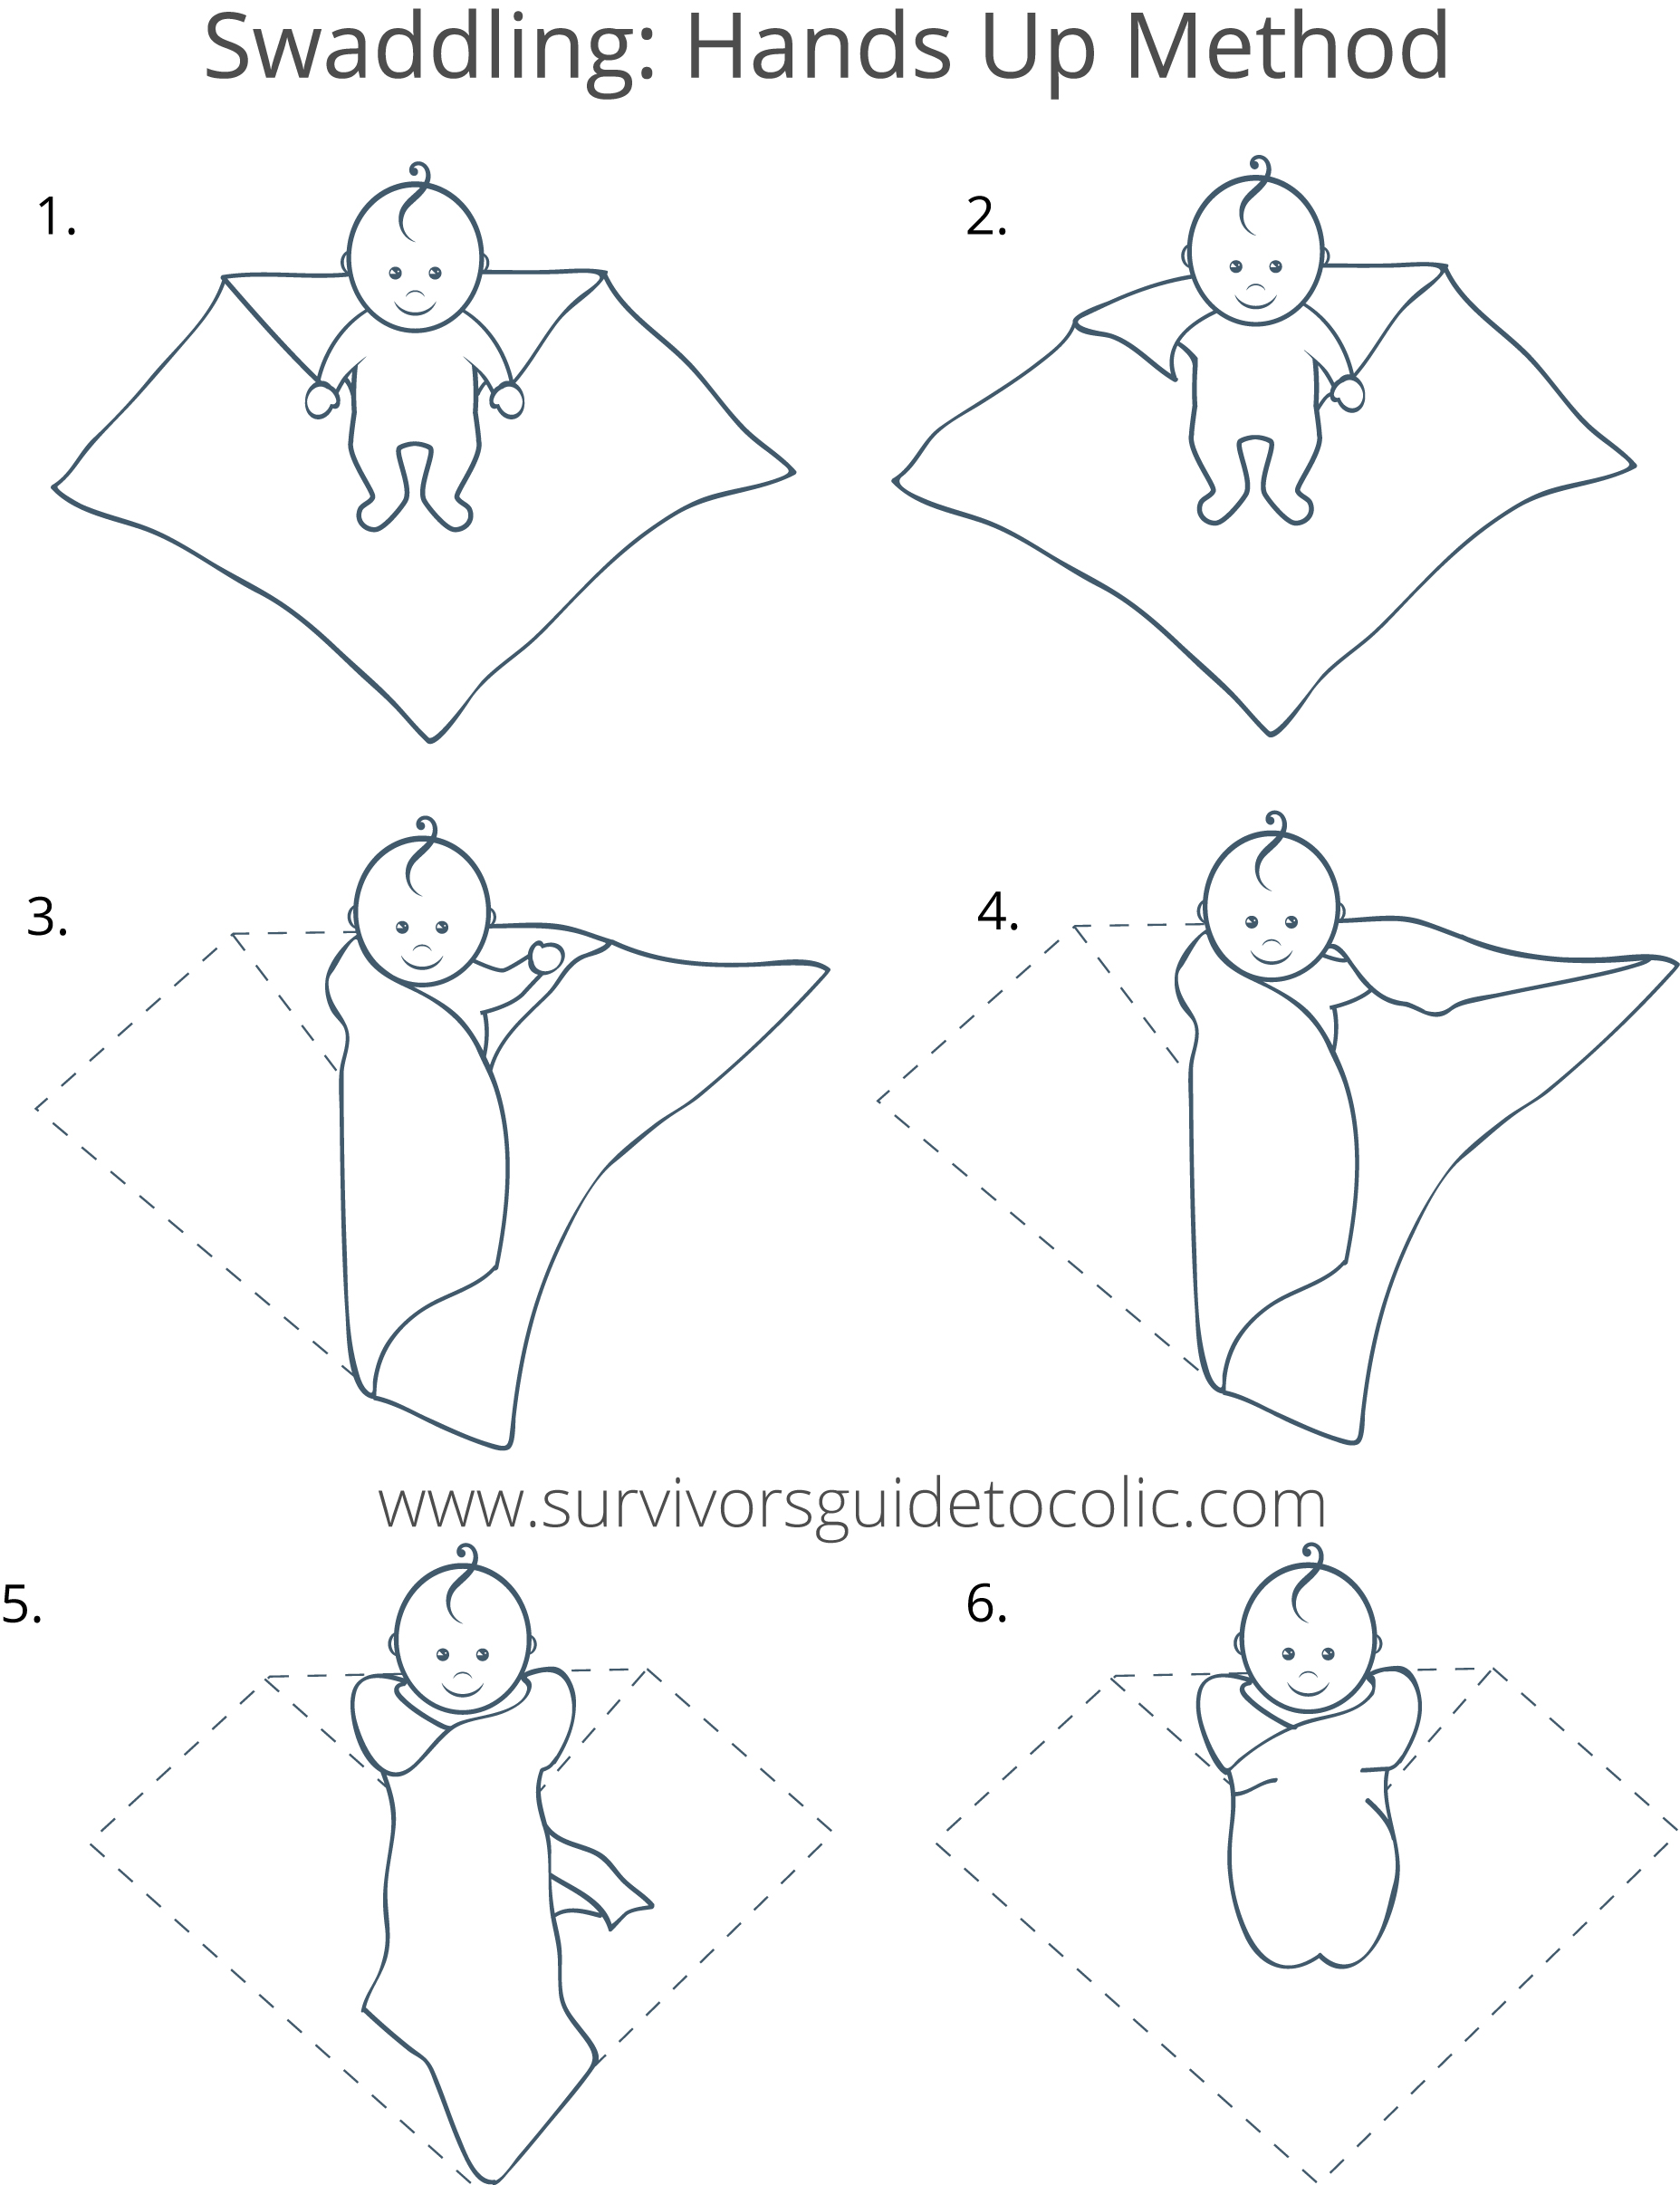 Hands up method_poster.jpg